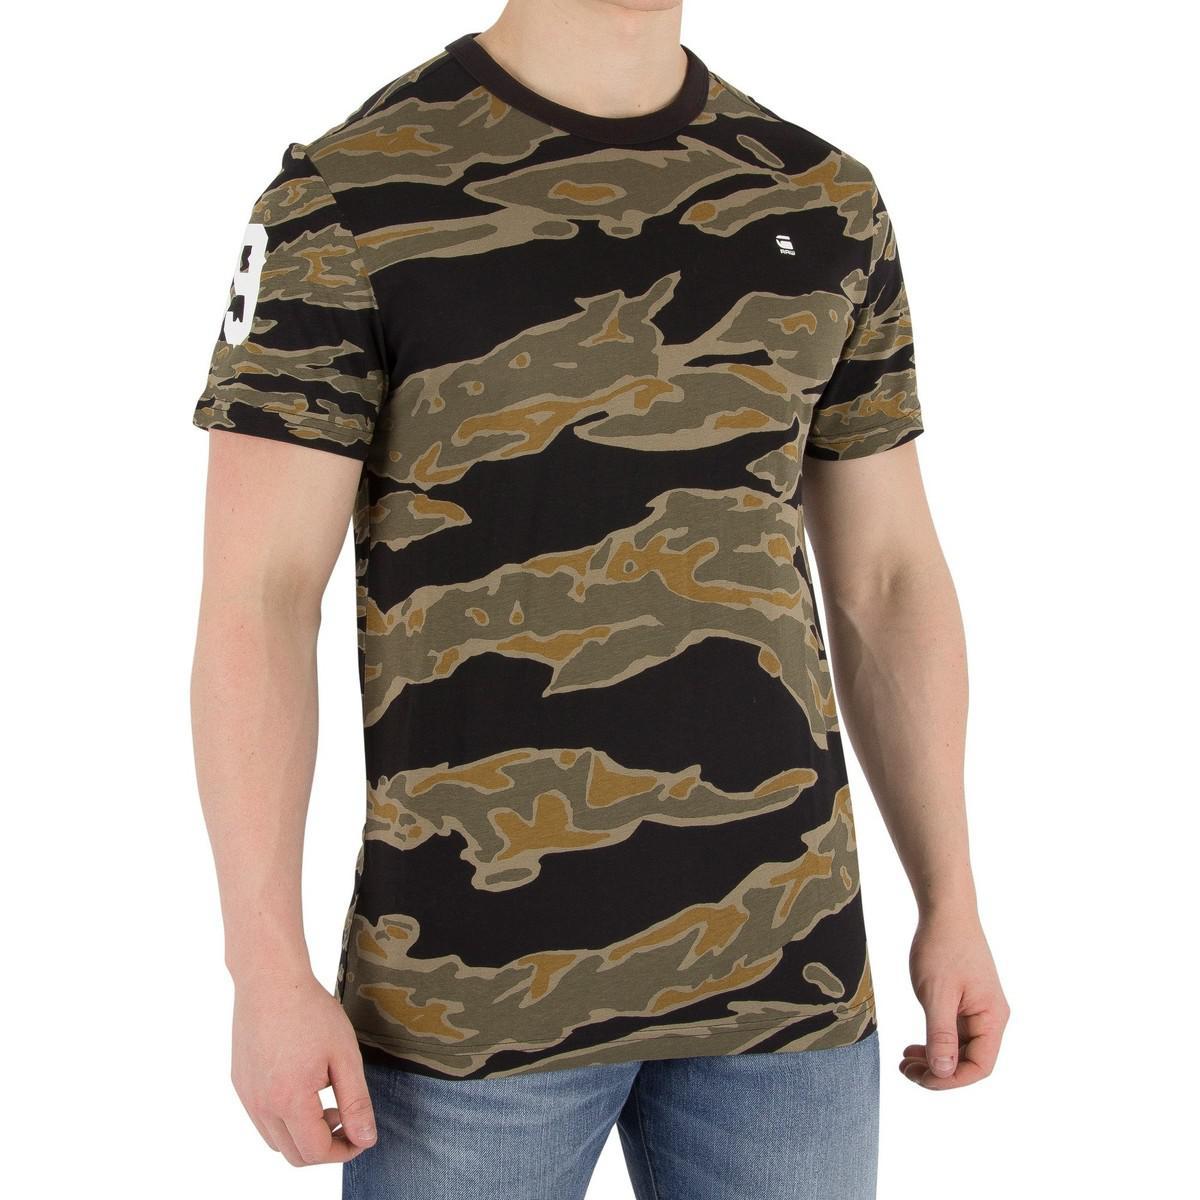 c7aafd8c G-Star RAW Men's Tertil T-shirt, Green Men's In Green in Green for ...